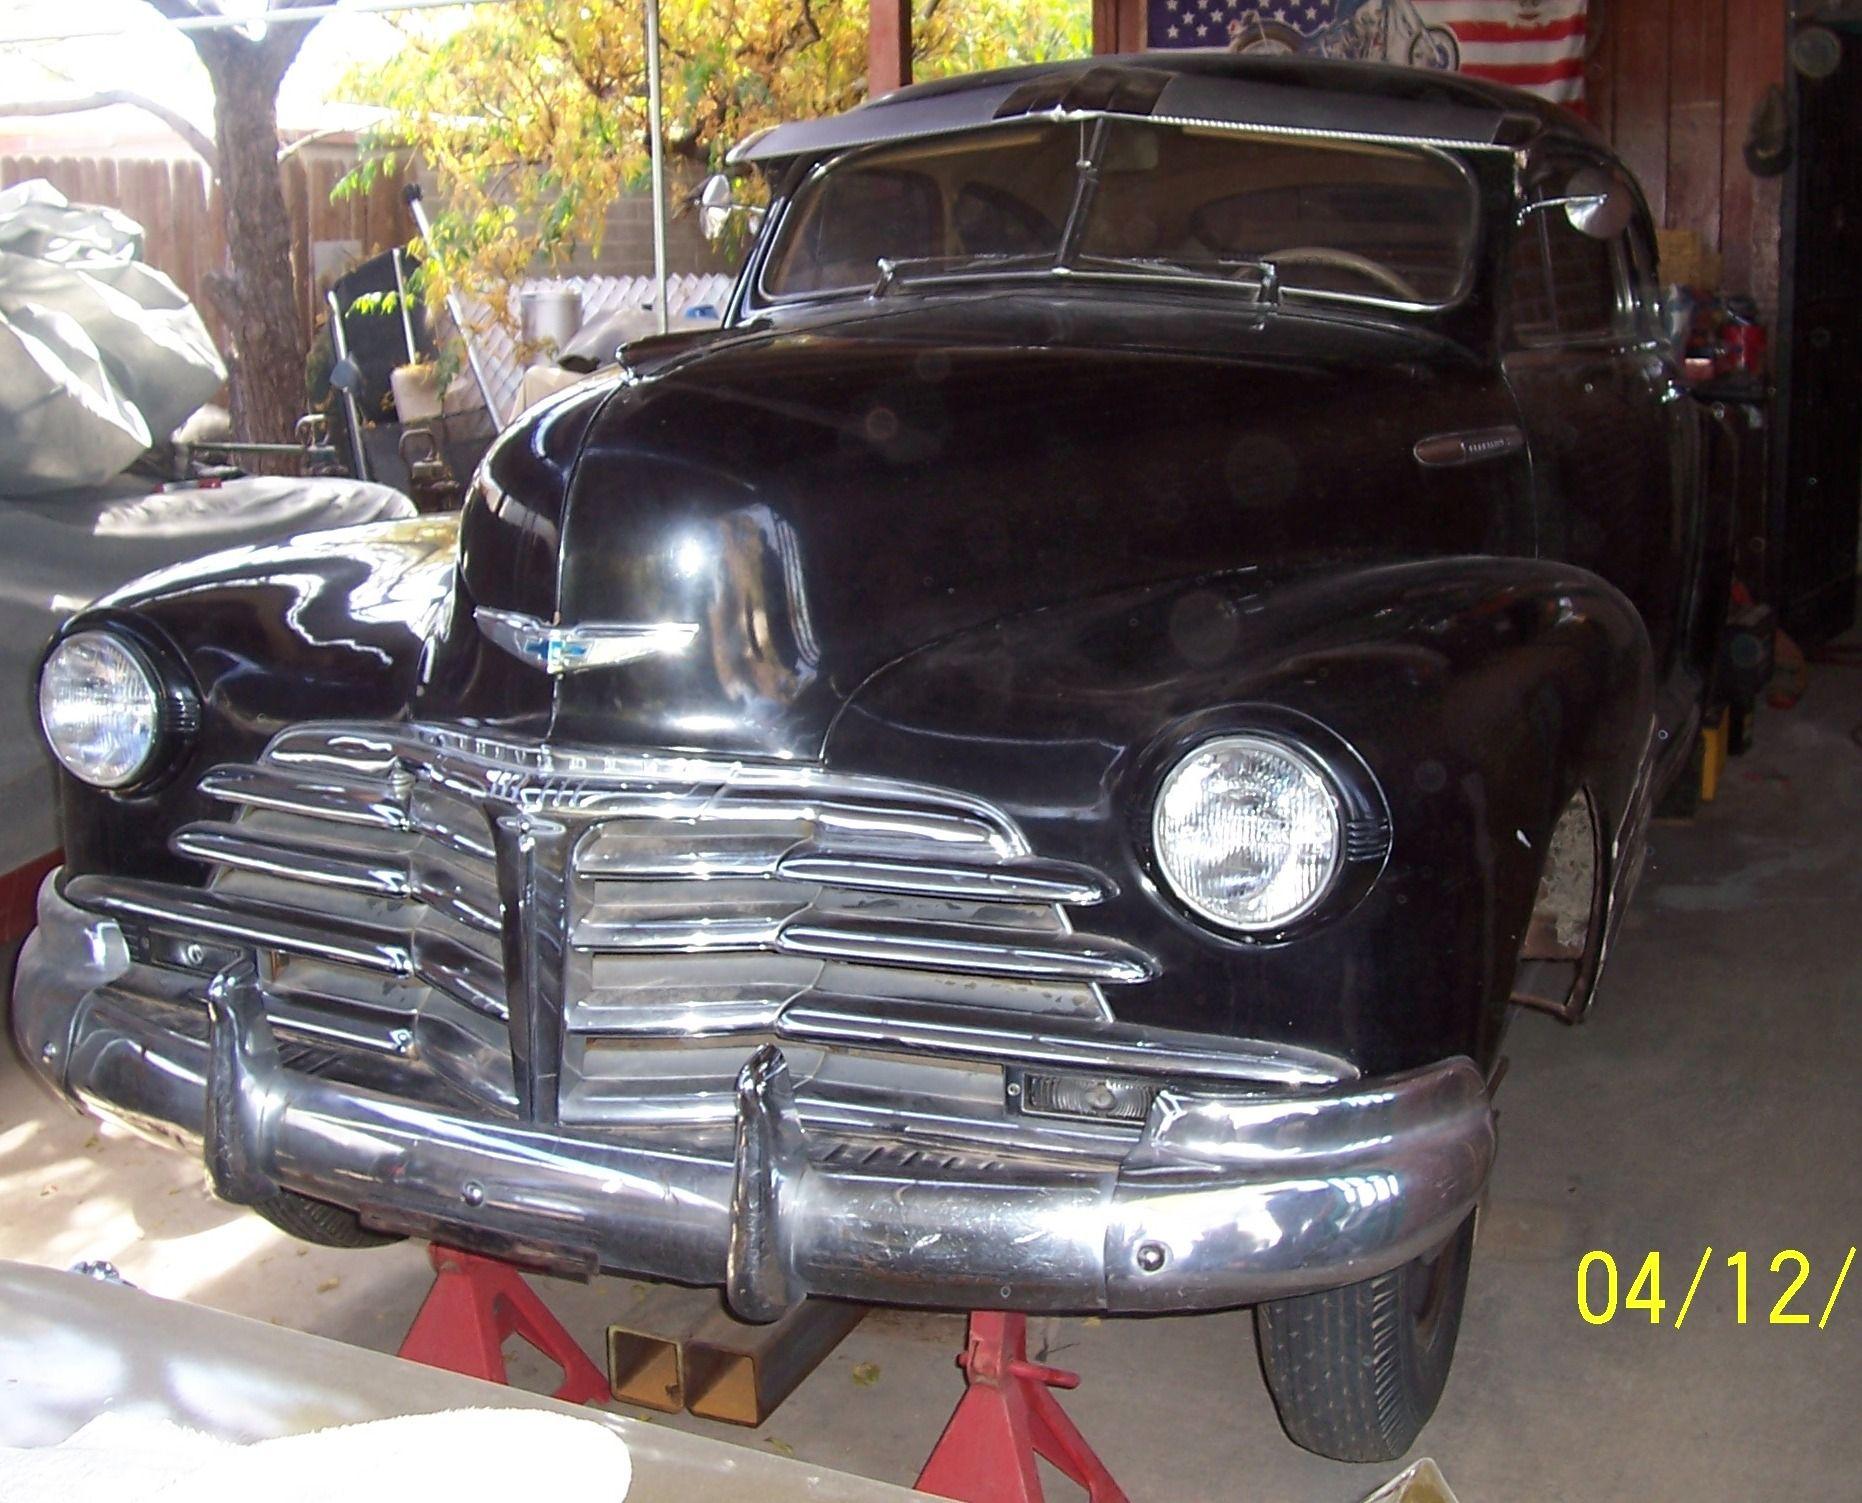 Rolling On... A 1948 Chevrolet Fleetline Survivor! Very rare model ...